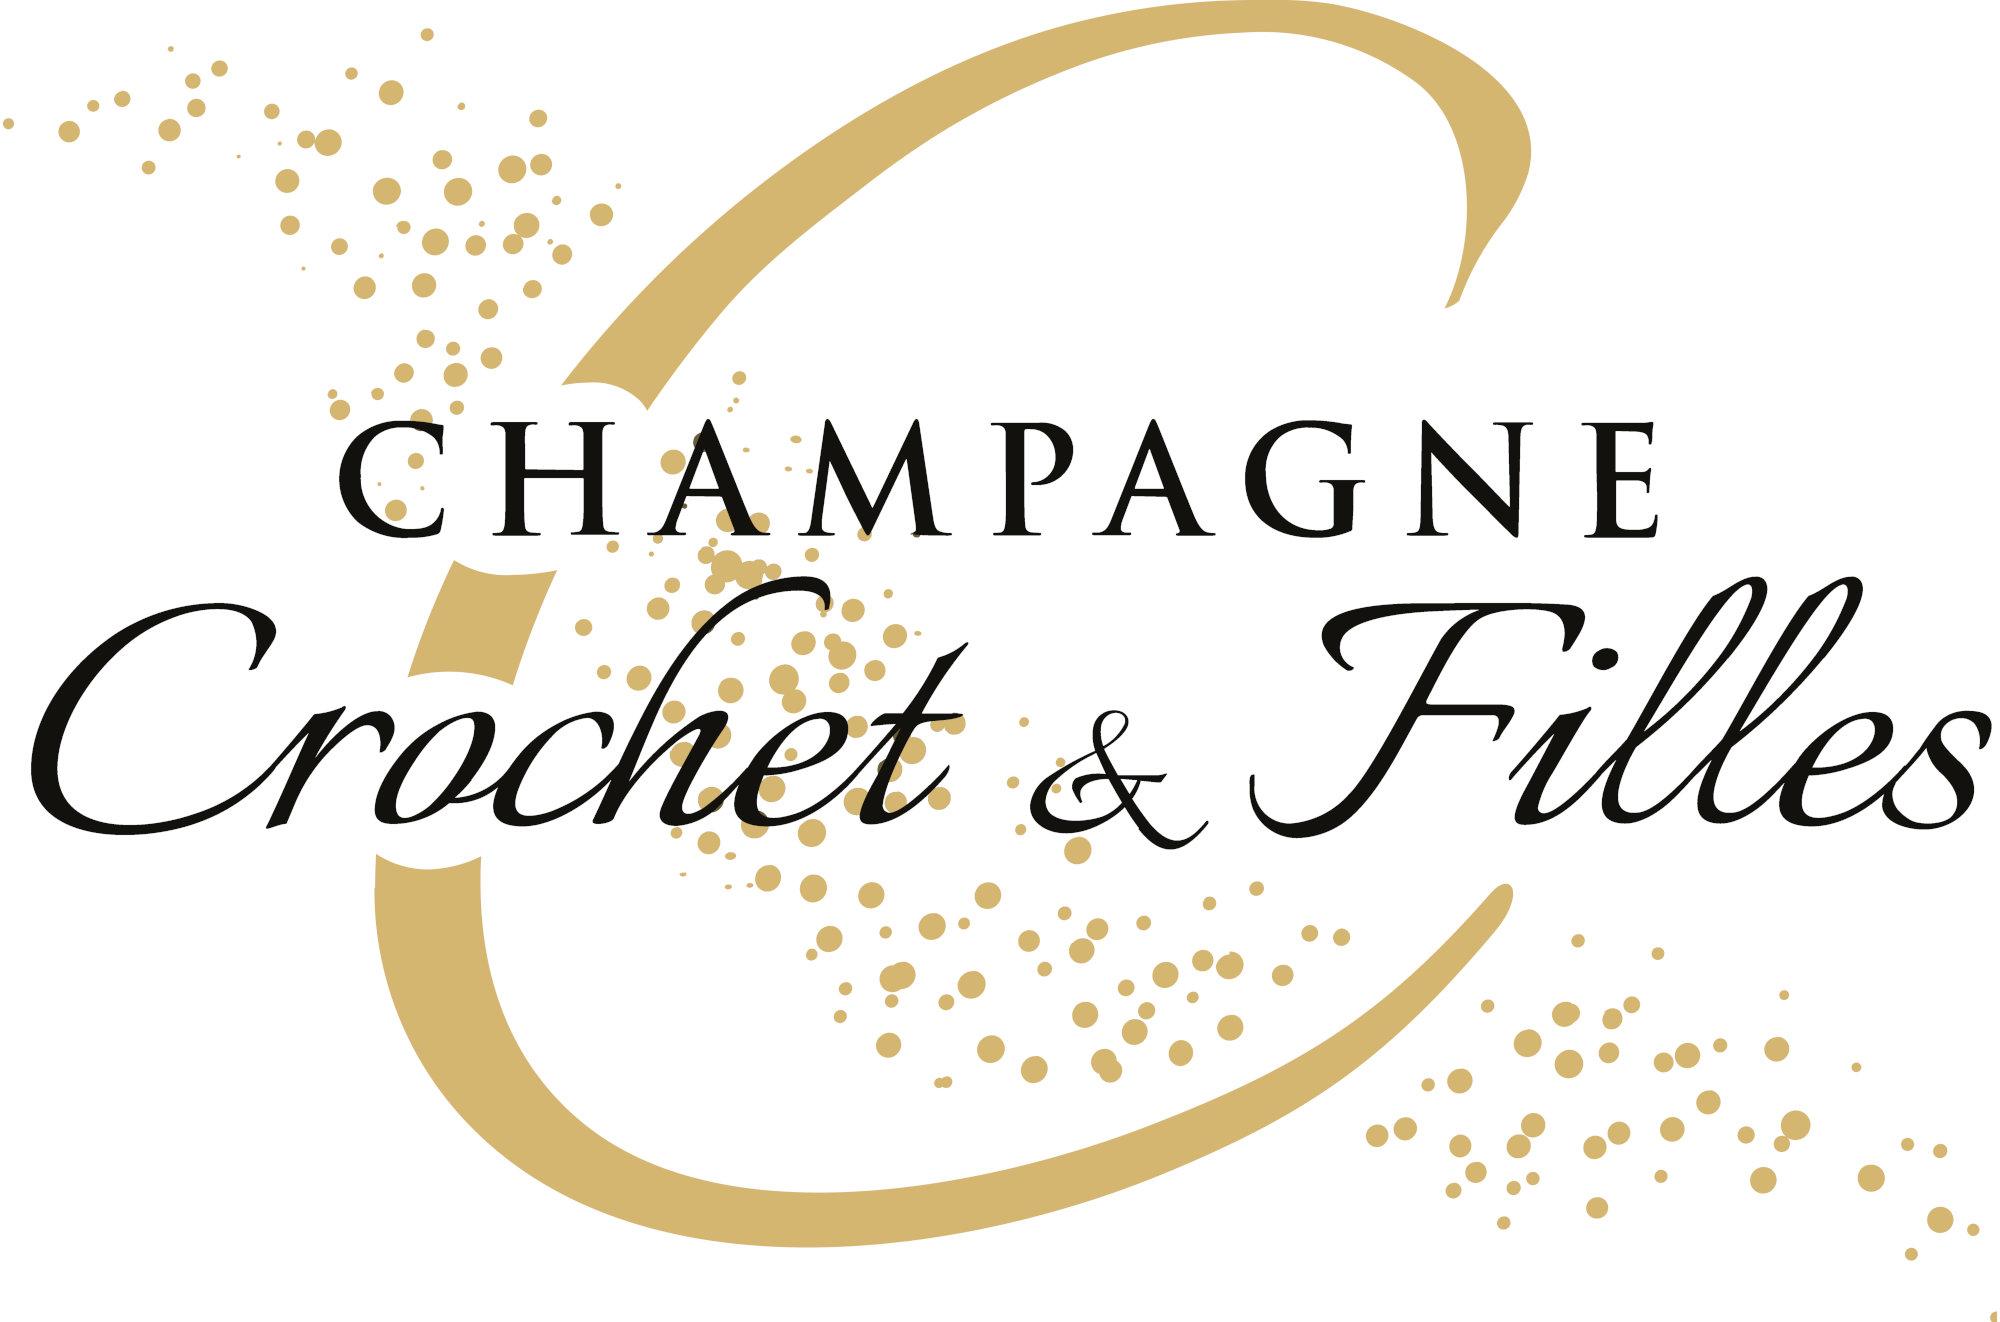 Crochet & Filles Champagne